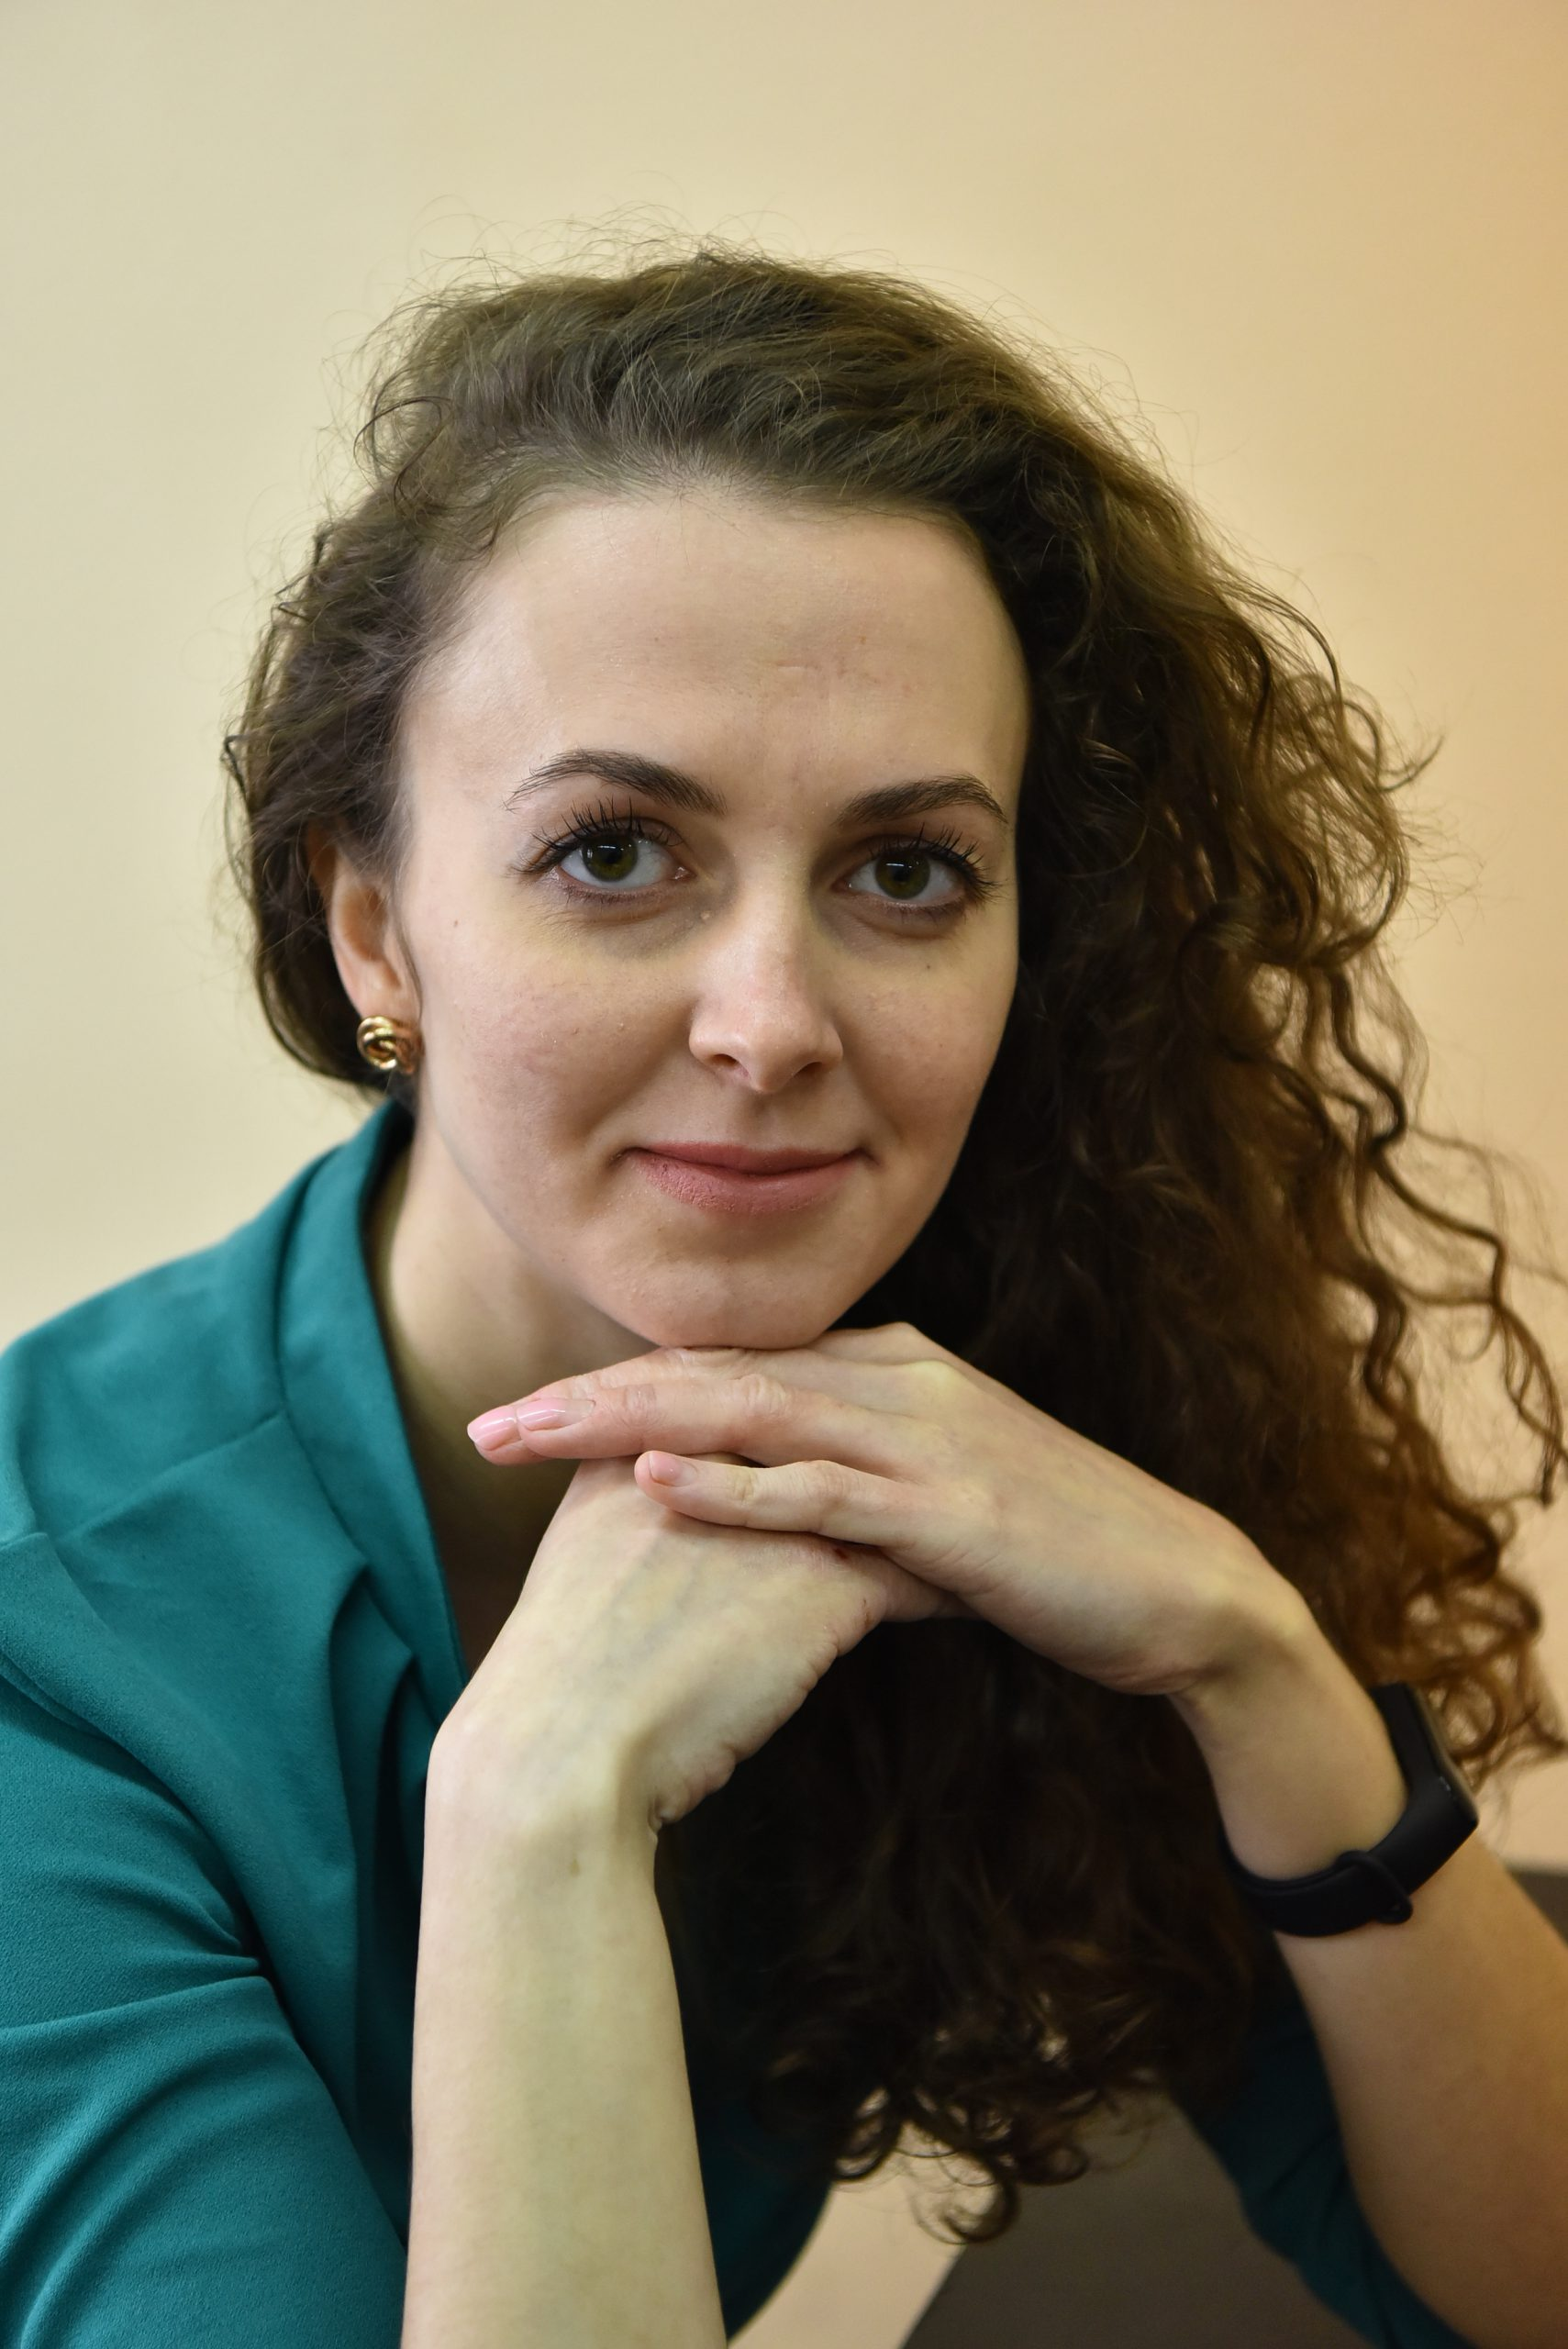 ЩЕРБАКОВА Тетяна Геннадіївна